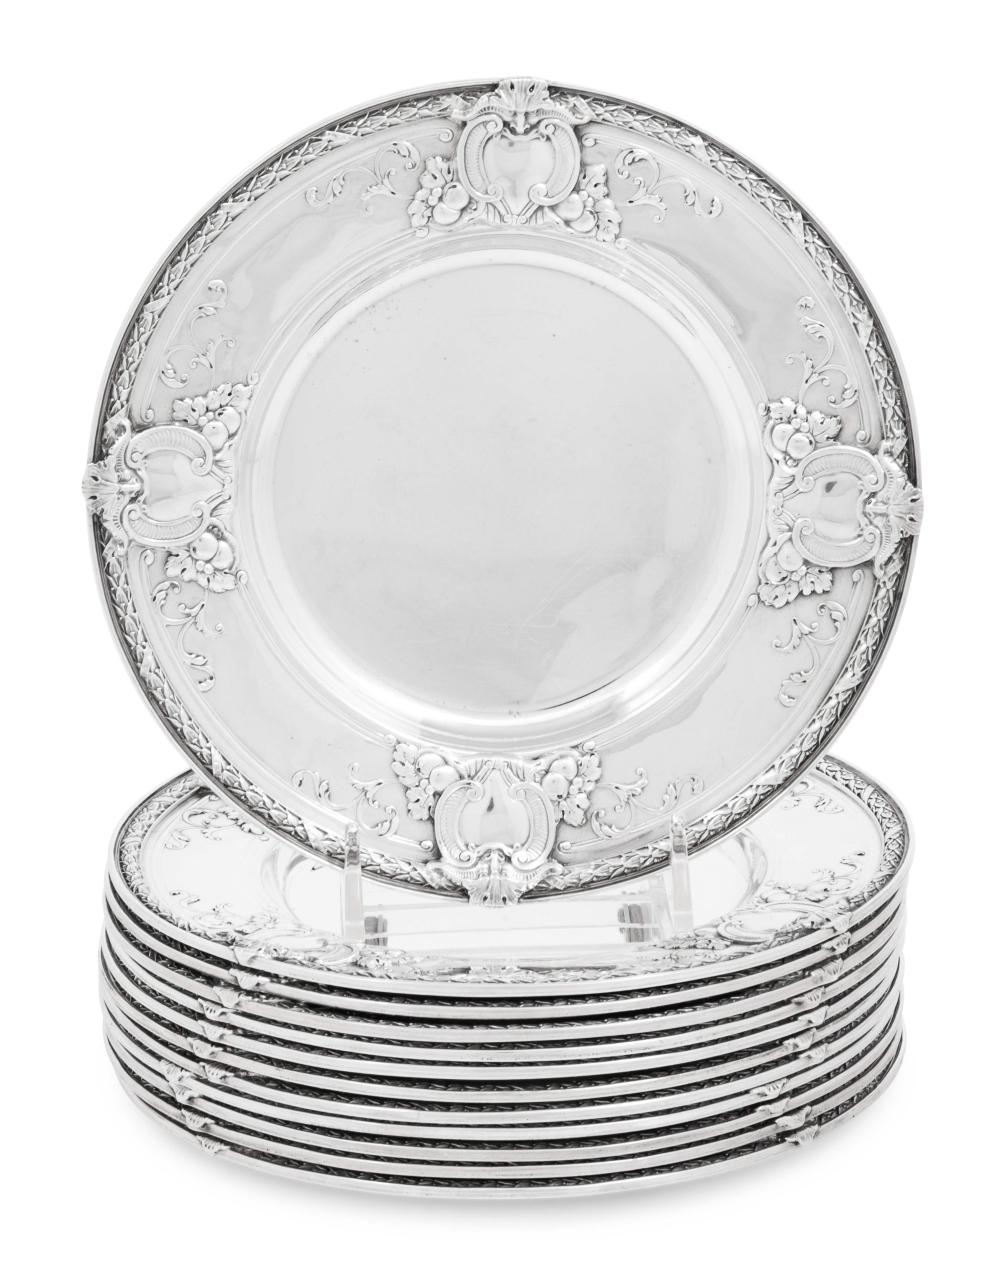 A Set of Twelve American Silver Bread Plates